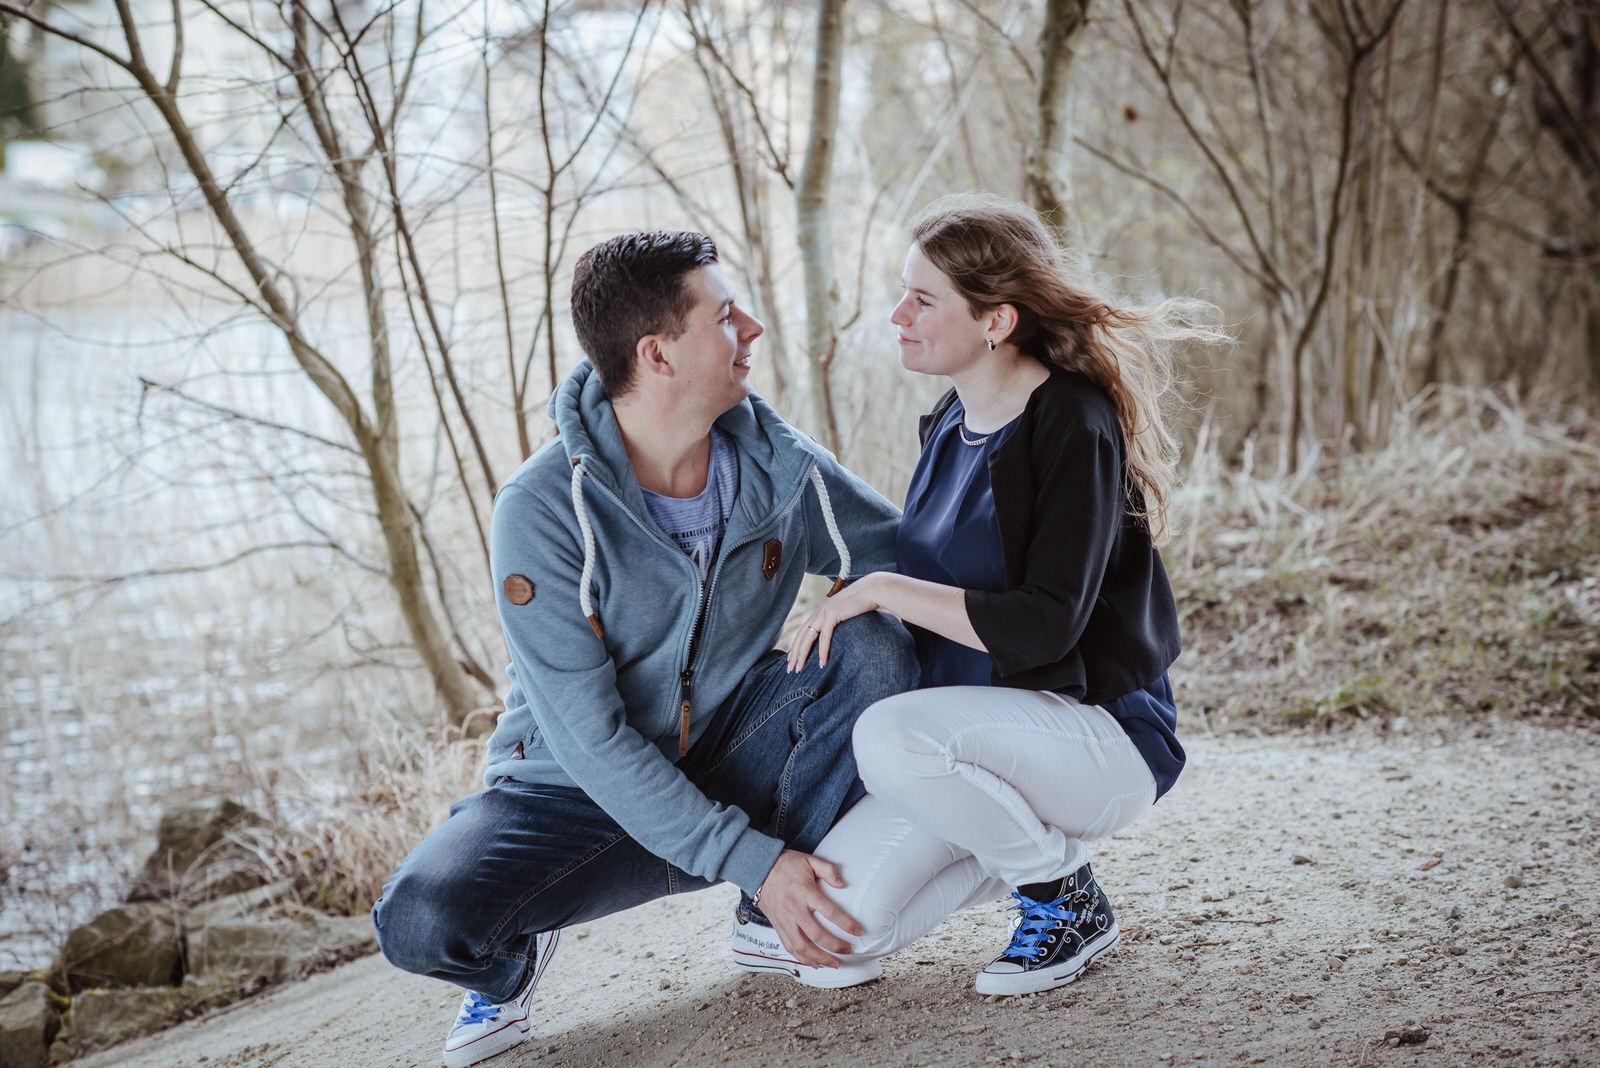 Engagement Shooting vor der Hochzeit 11i-photography.com